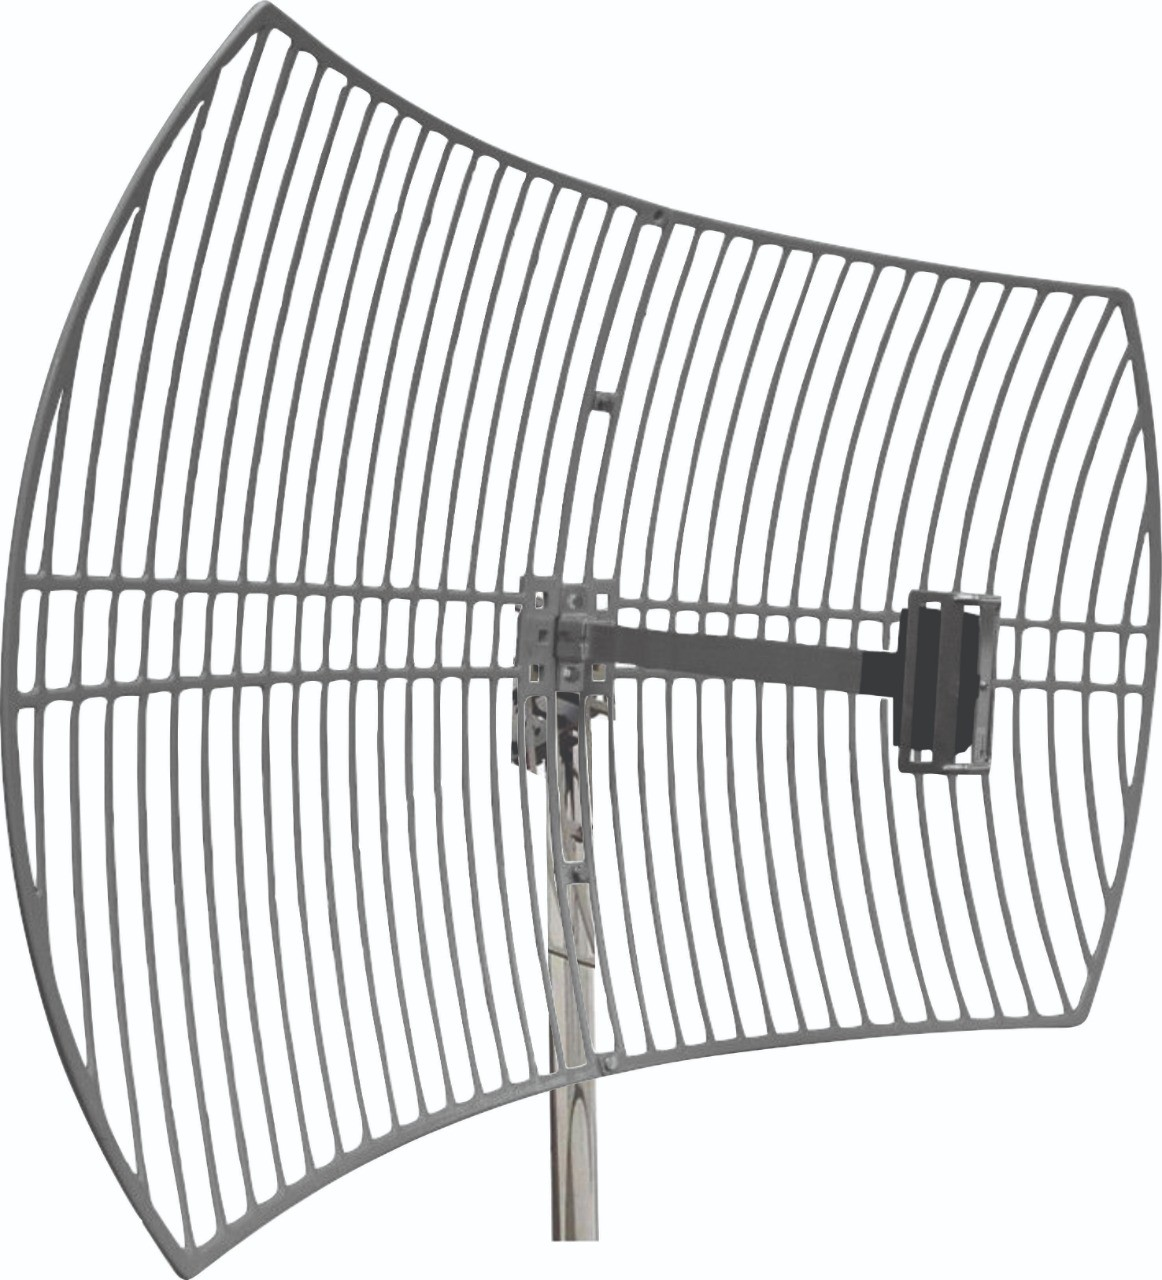 Antena Celular Semi Parabólica Drucos 24dBi 1800/2100Mhz